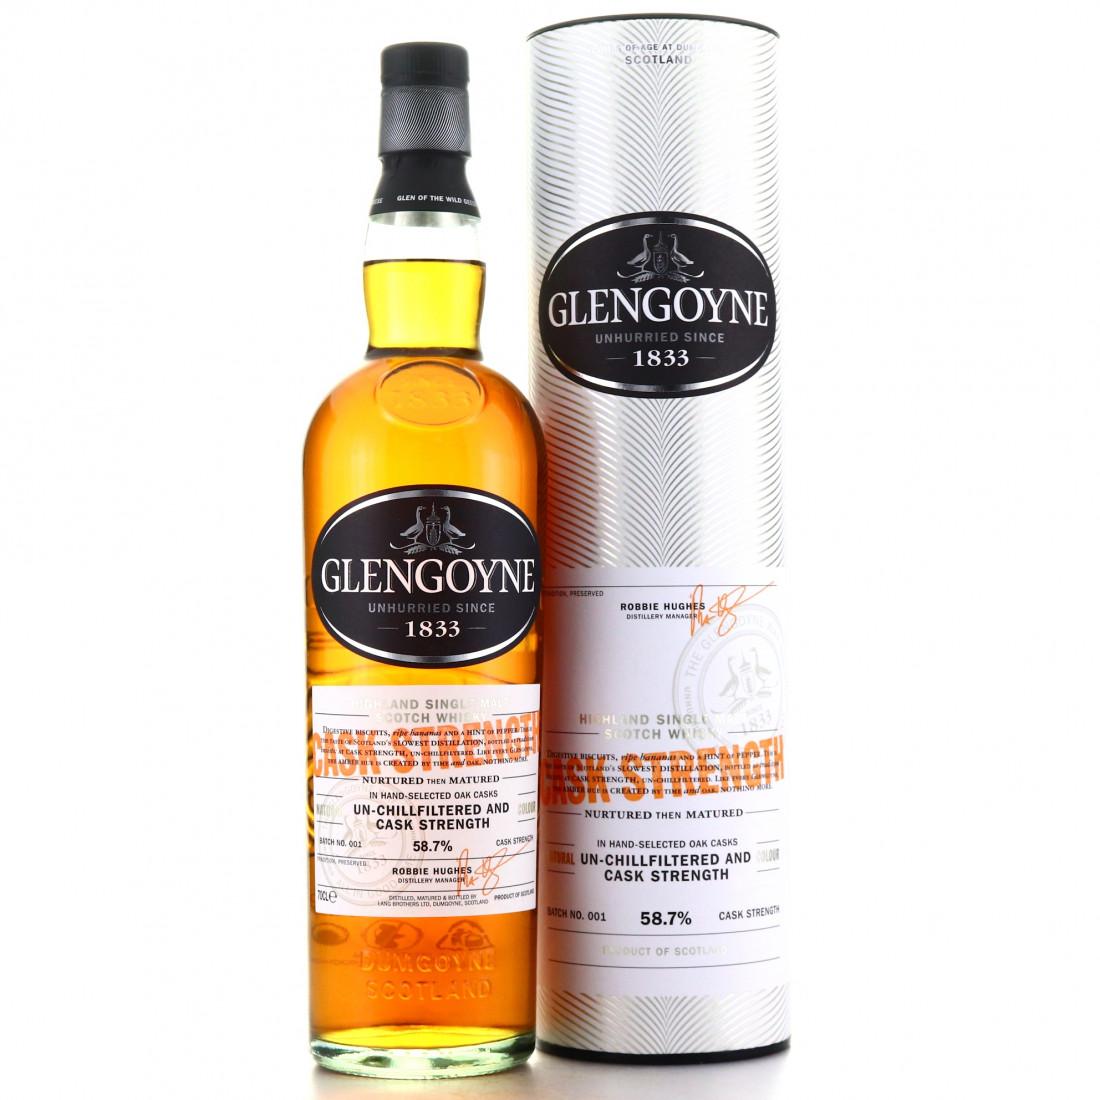 Glengoyne Cask Strength Batch #1